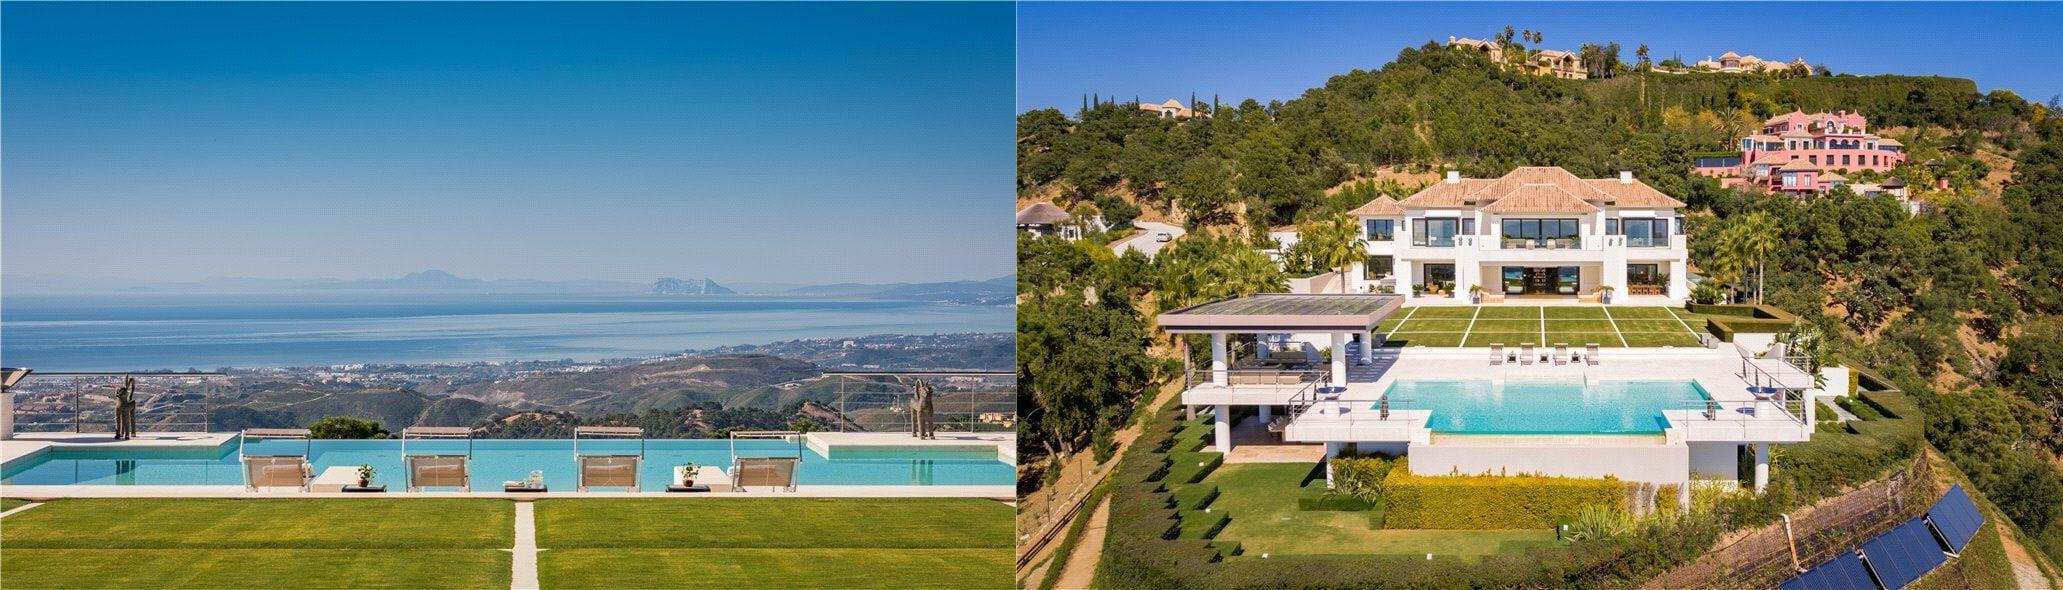 Villa en La Zagaleta, Marbella